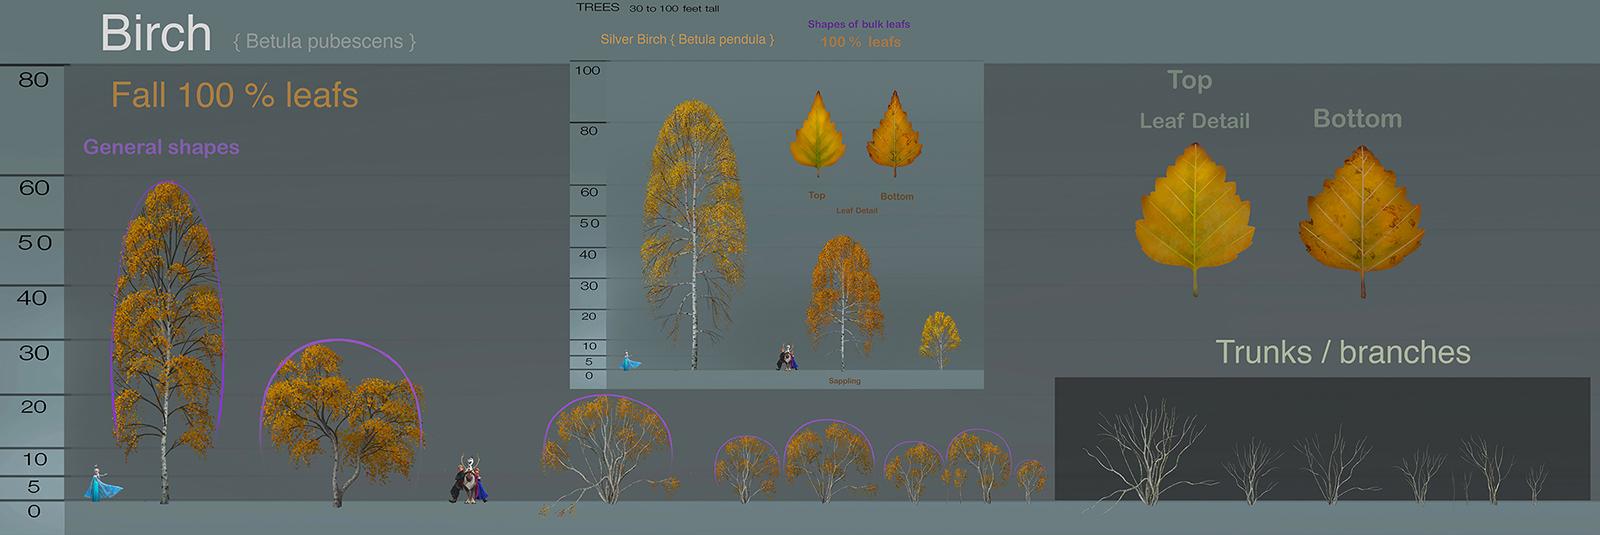 birch_final_fall_general_shapes